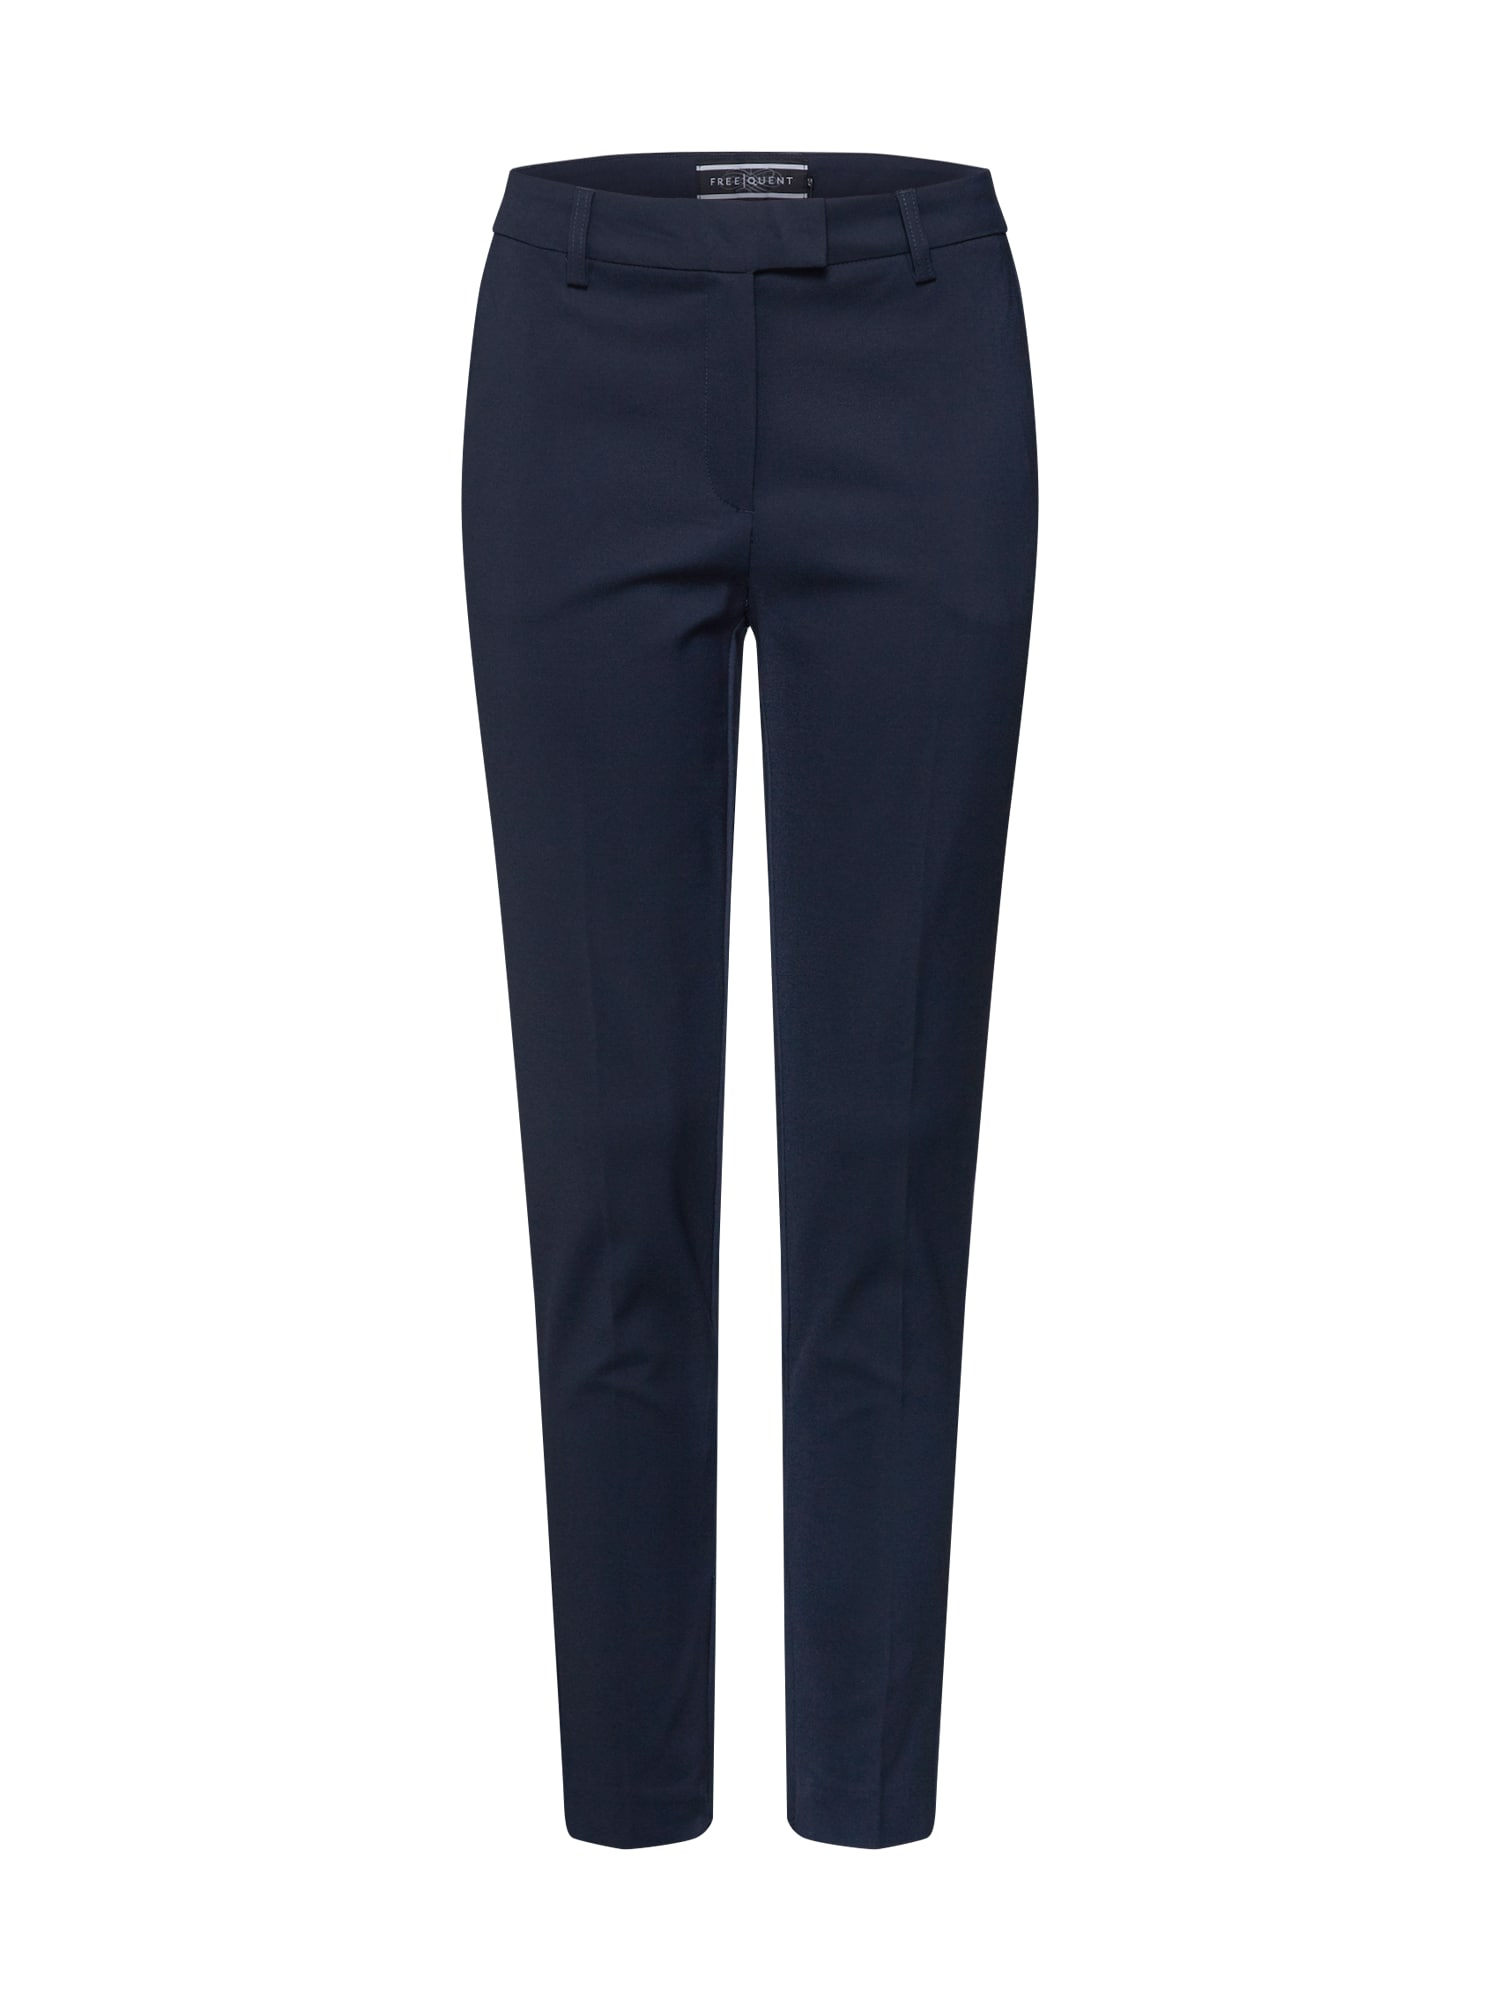 Freequent Chino stiliaus kelnės tamsiai mėlyna